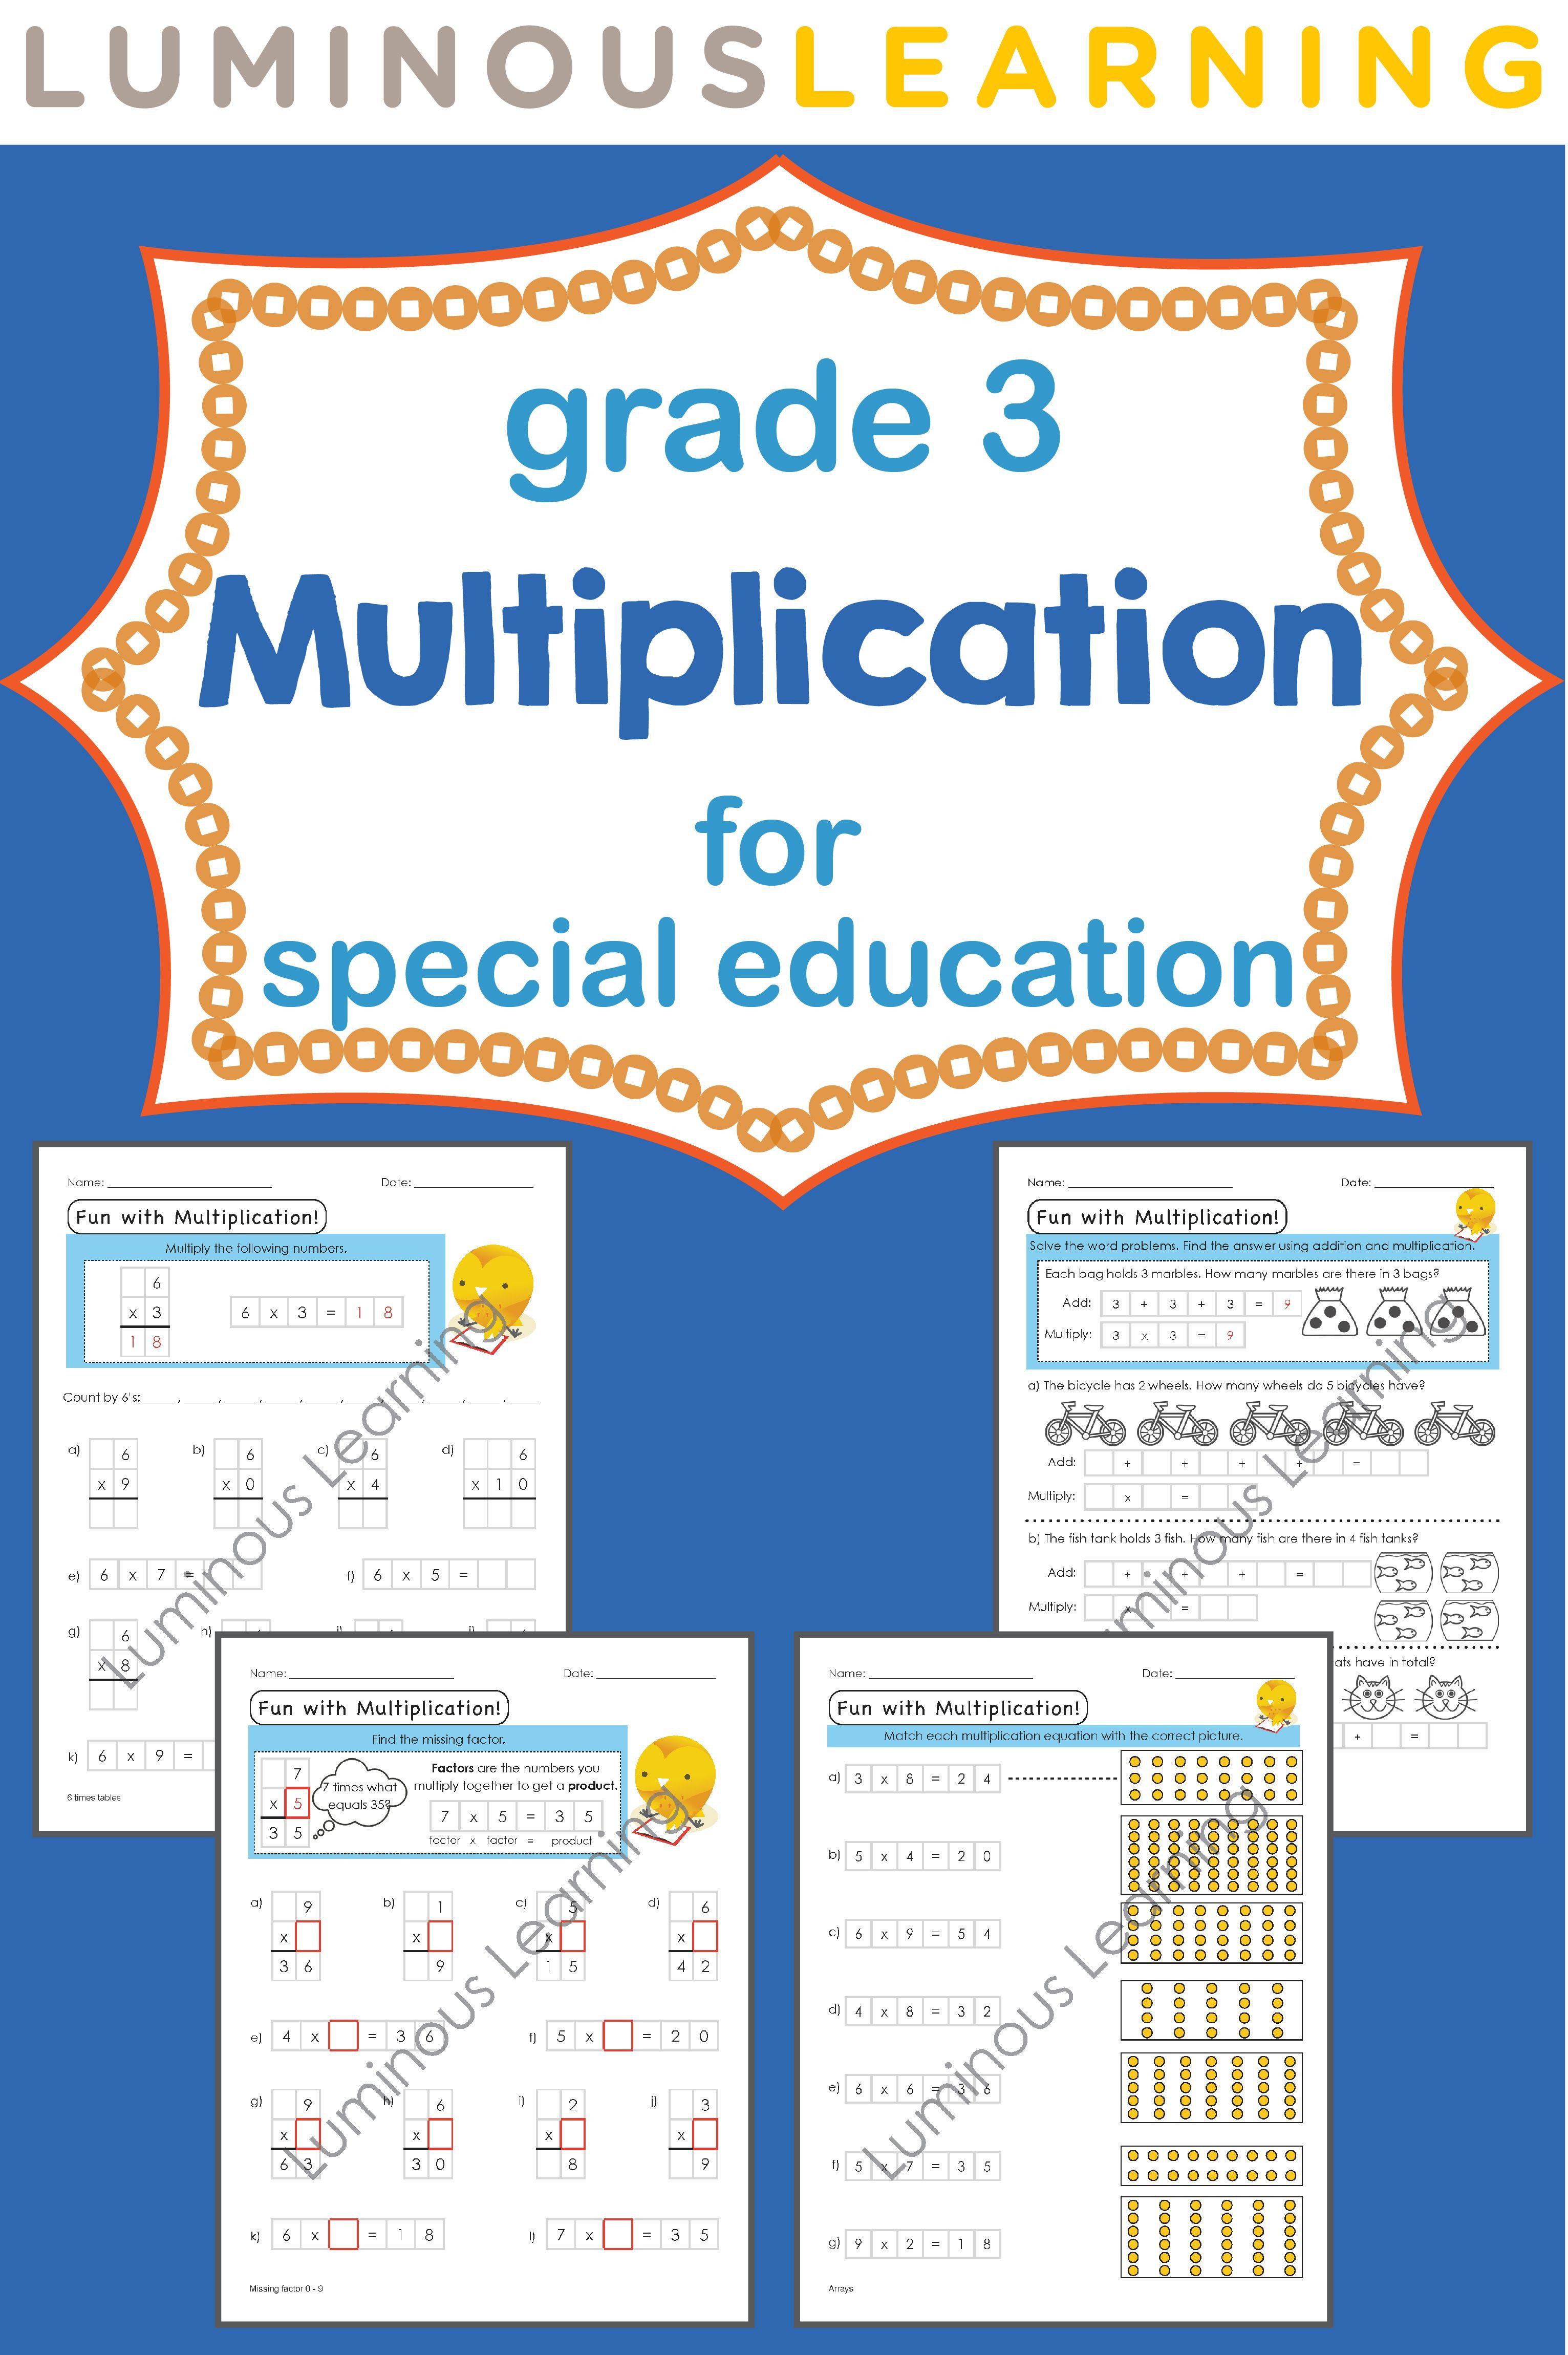 Grade 3 multiplication printable workbook visual aids grade 3 multiplication printable workbook fandeluxe Gallery